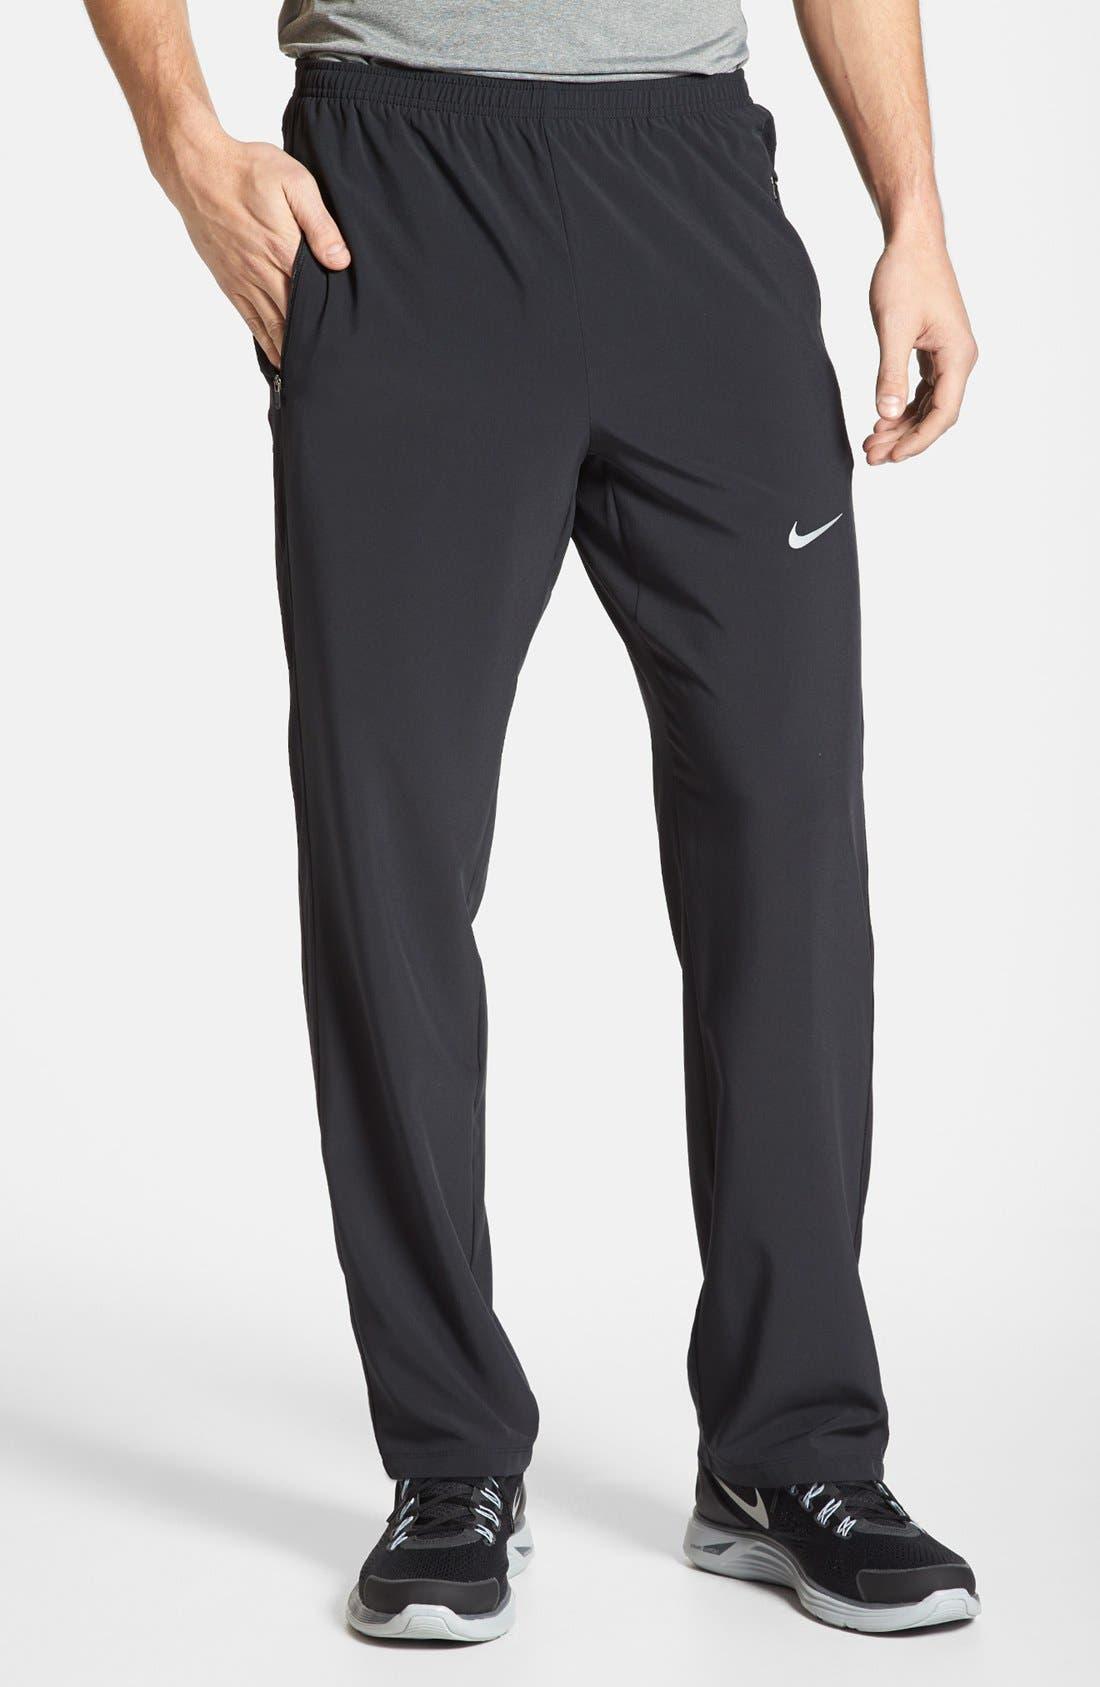 Main Image - Nike 'Dri-FIT SW' Stretch Woven Pants